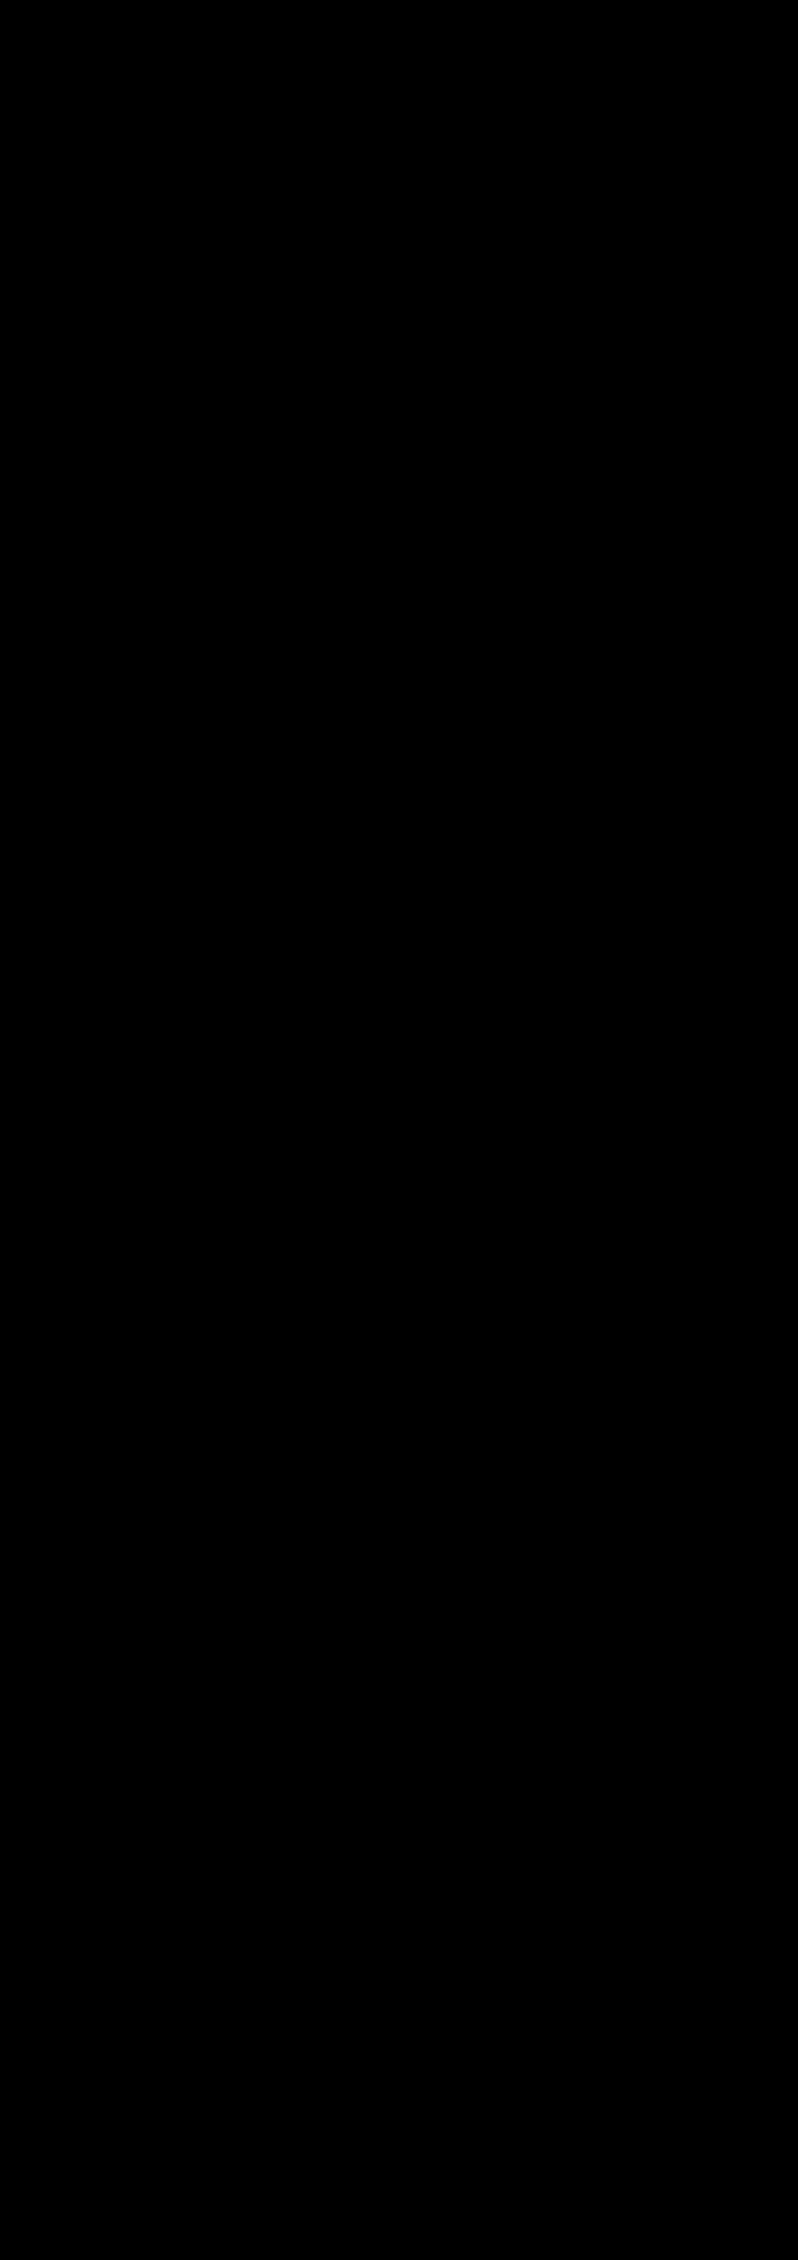 hanging bird cage silhouette by gdj images silhouettes et transferts imprimer pinterest. Black Bedroom Furniture Sets. Home Design Ideas